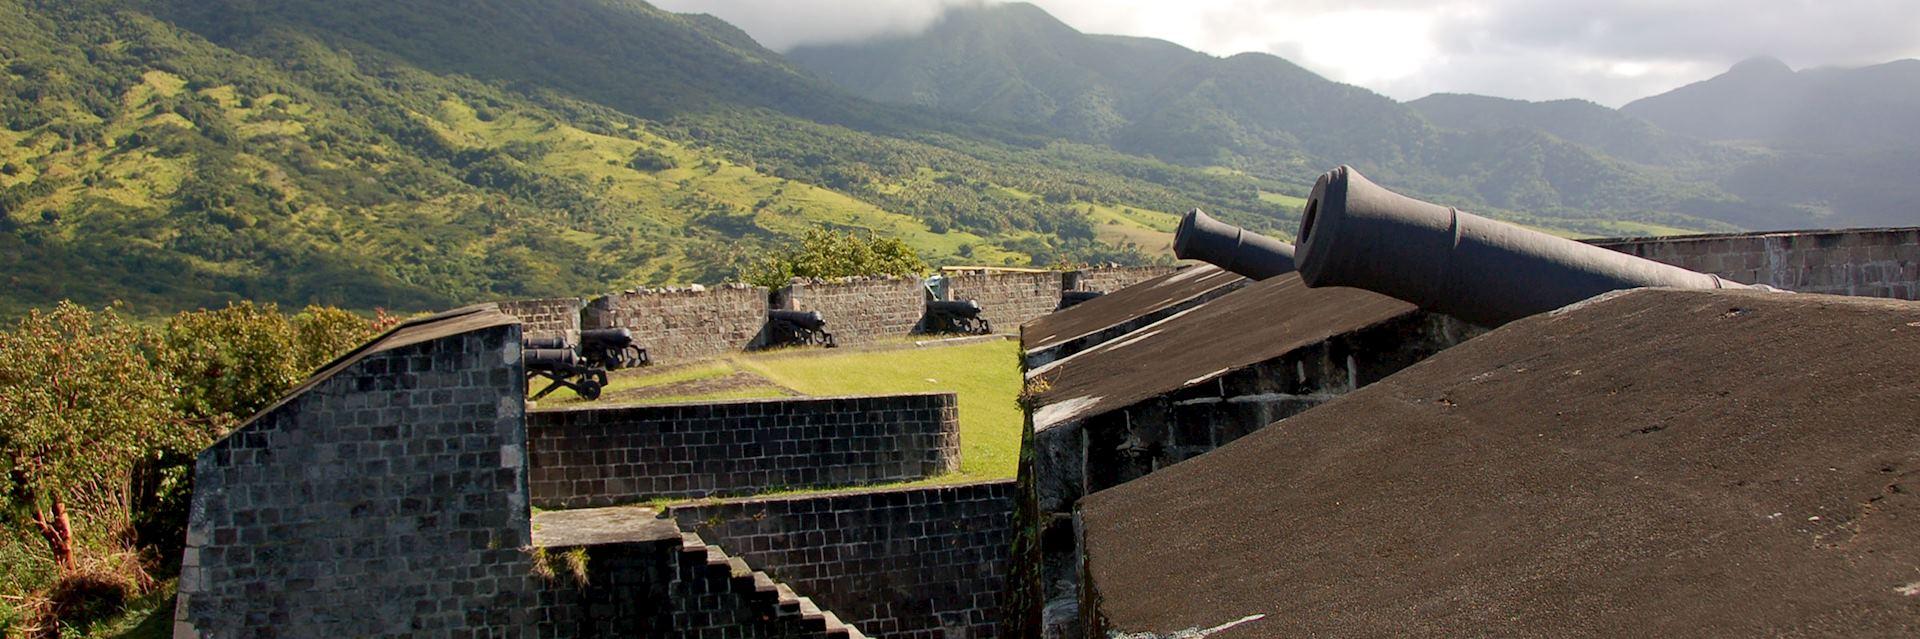 Brimstone Fortress, Saint Kitts